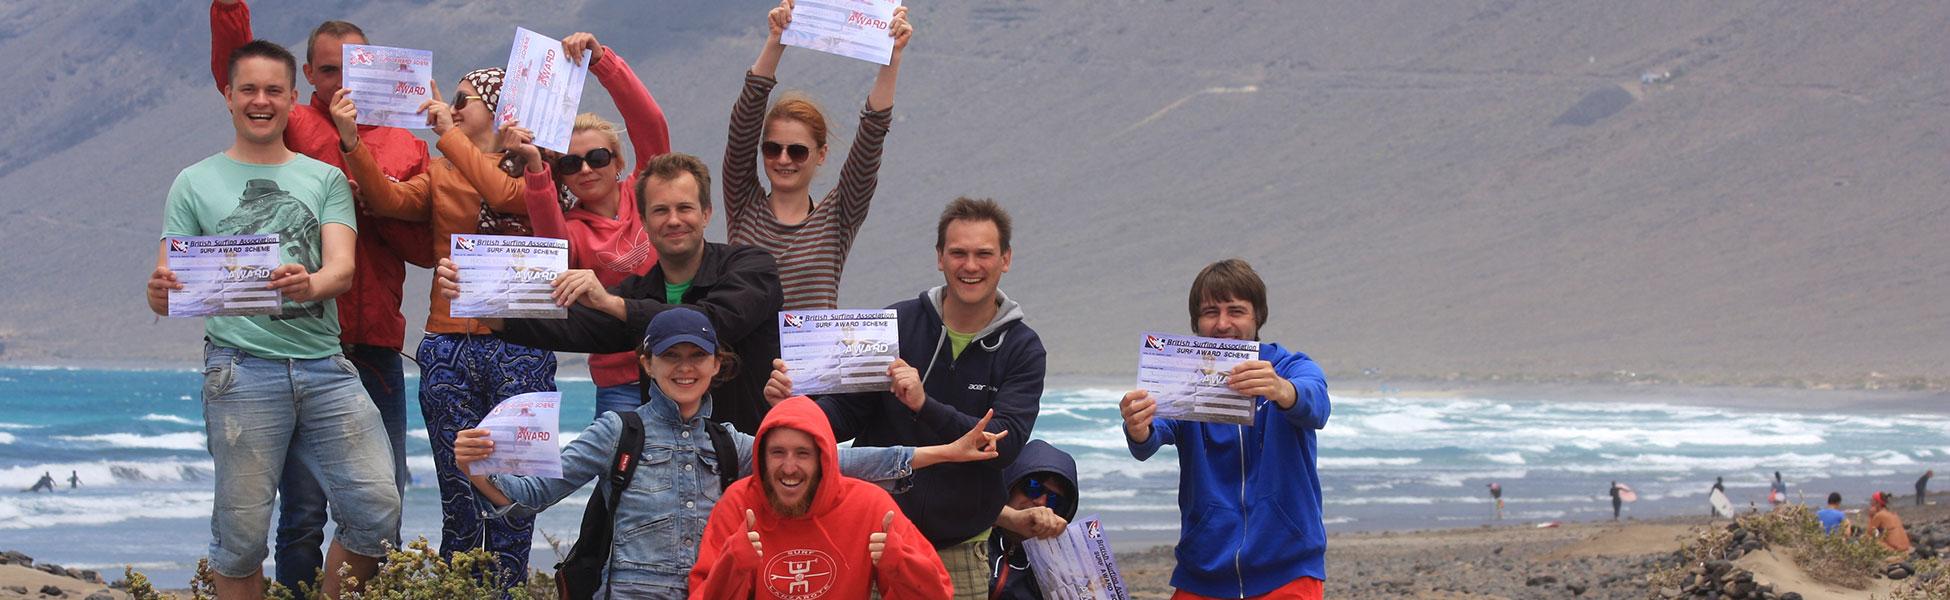 achieve with surf school sri lanka